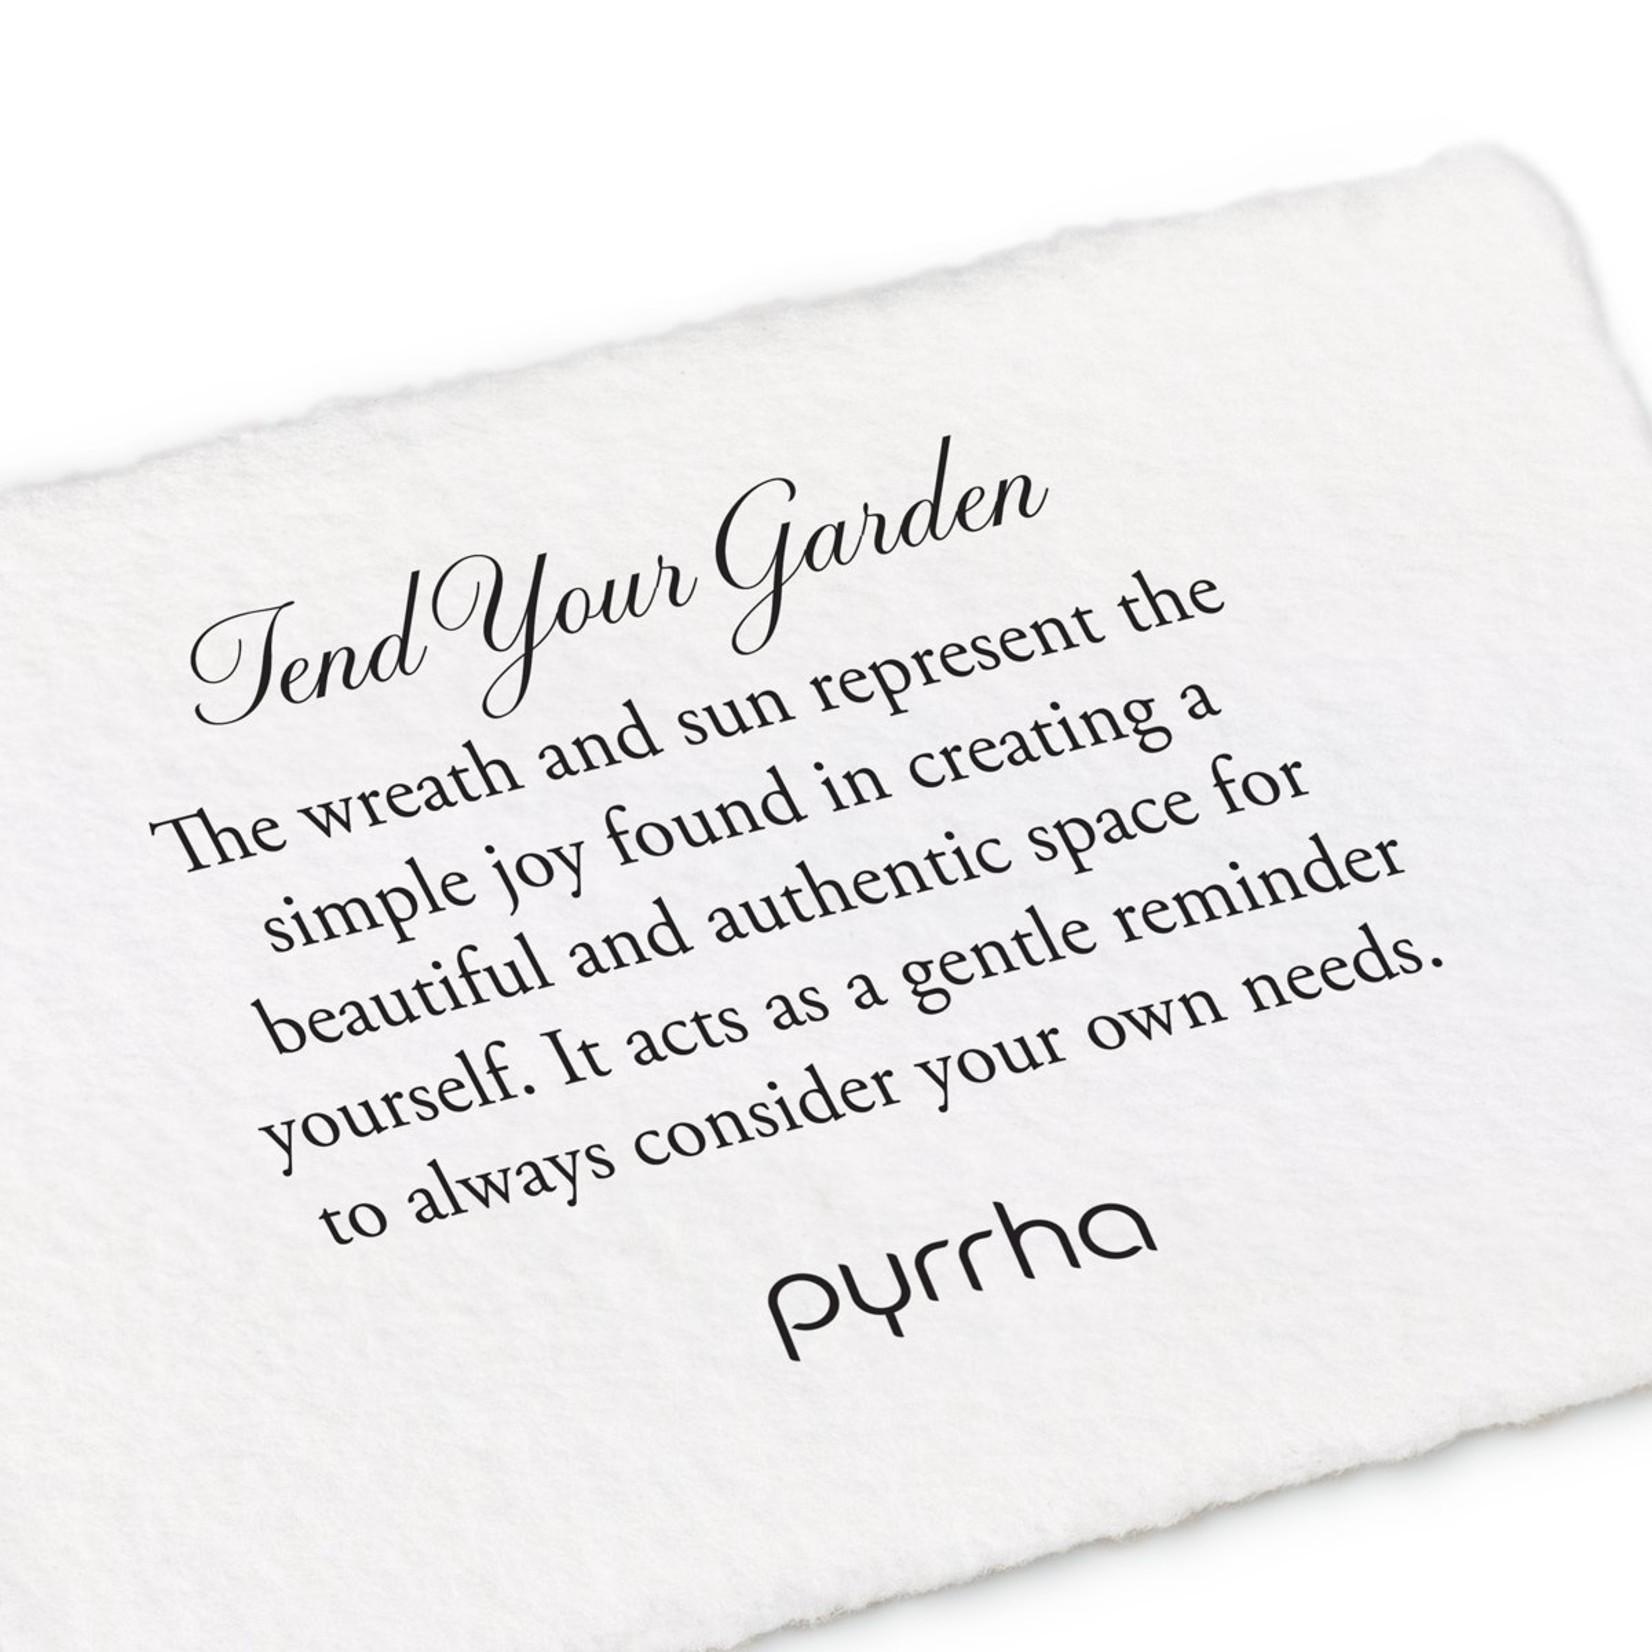 Pyrrha Tend Your Garden Signature Talisman